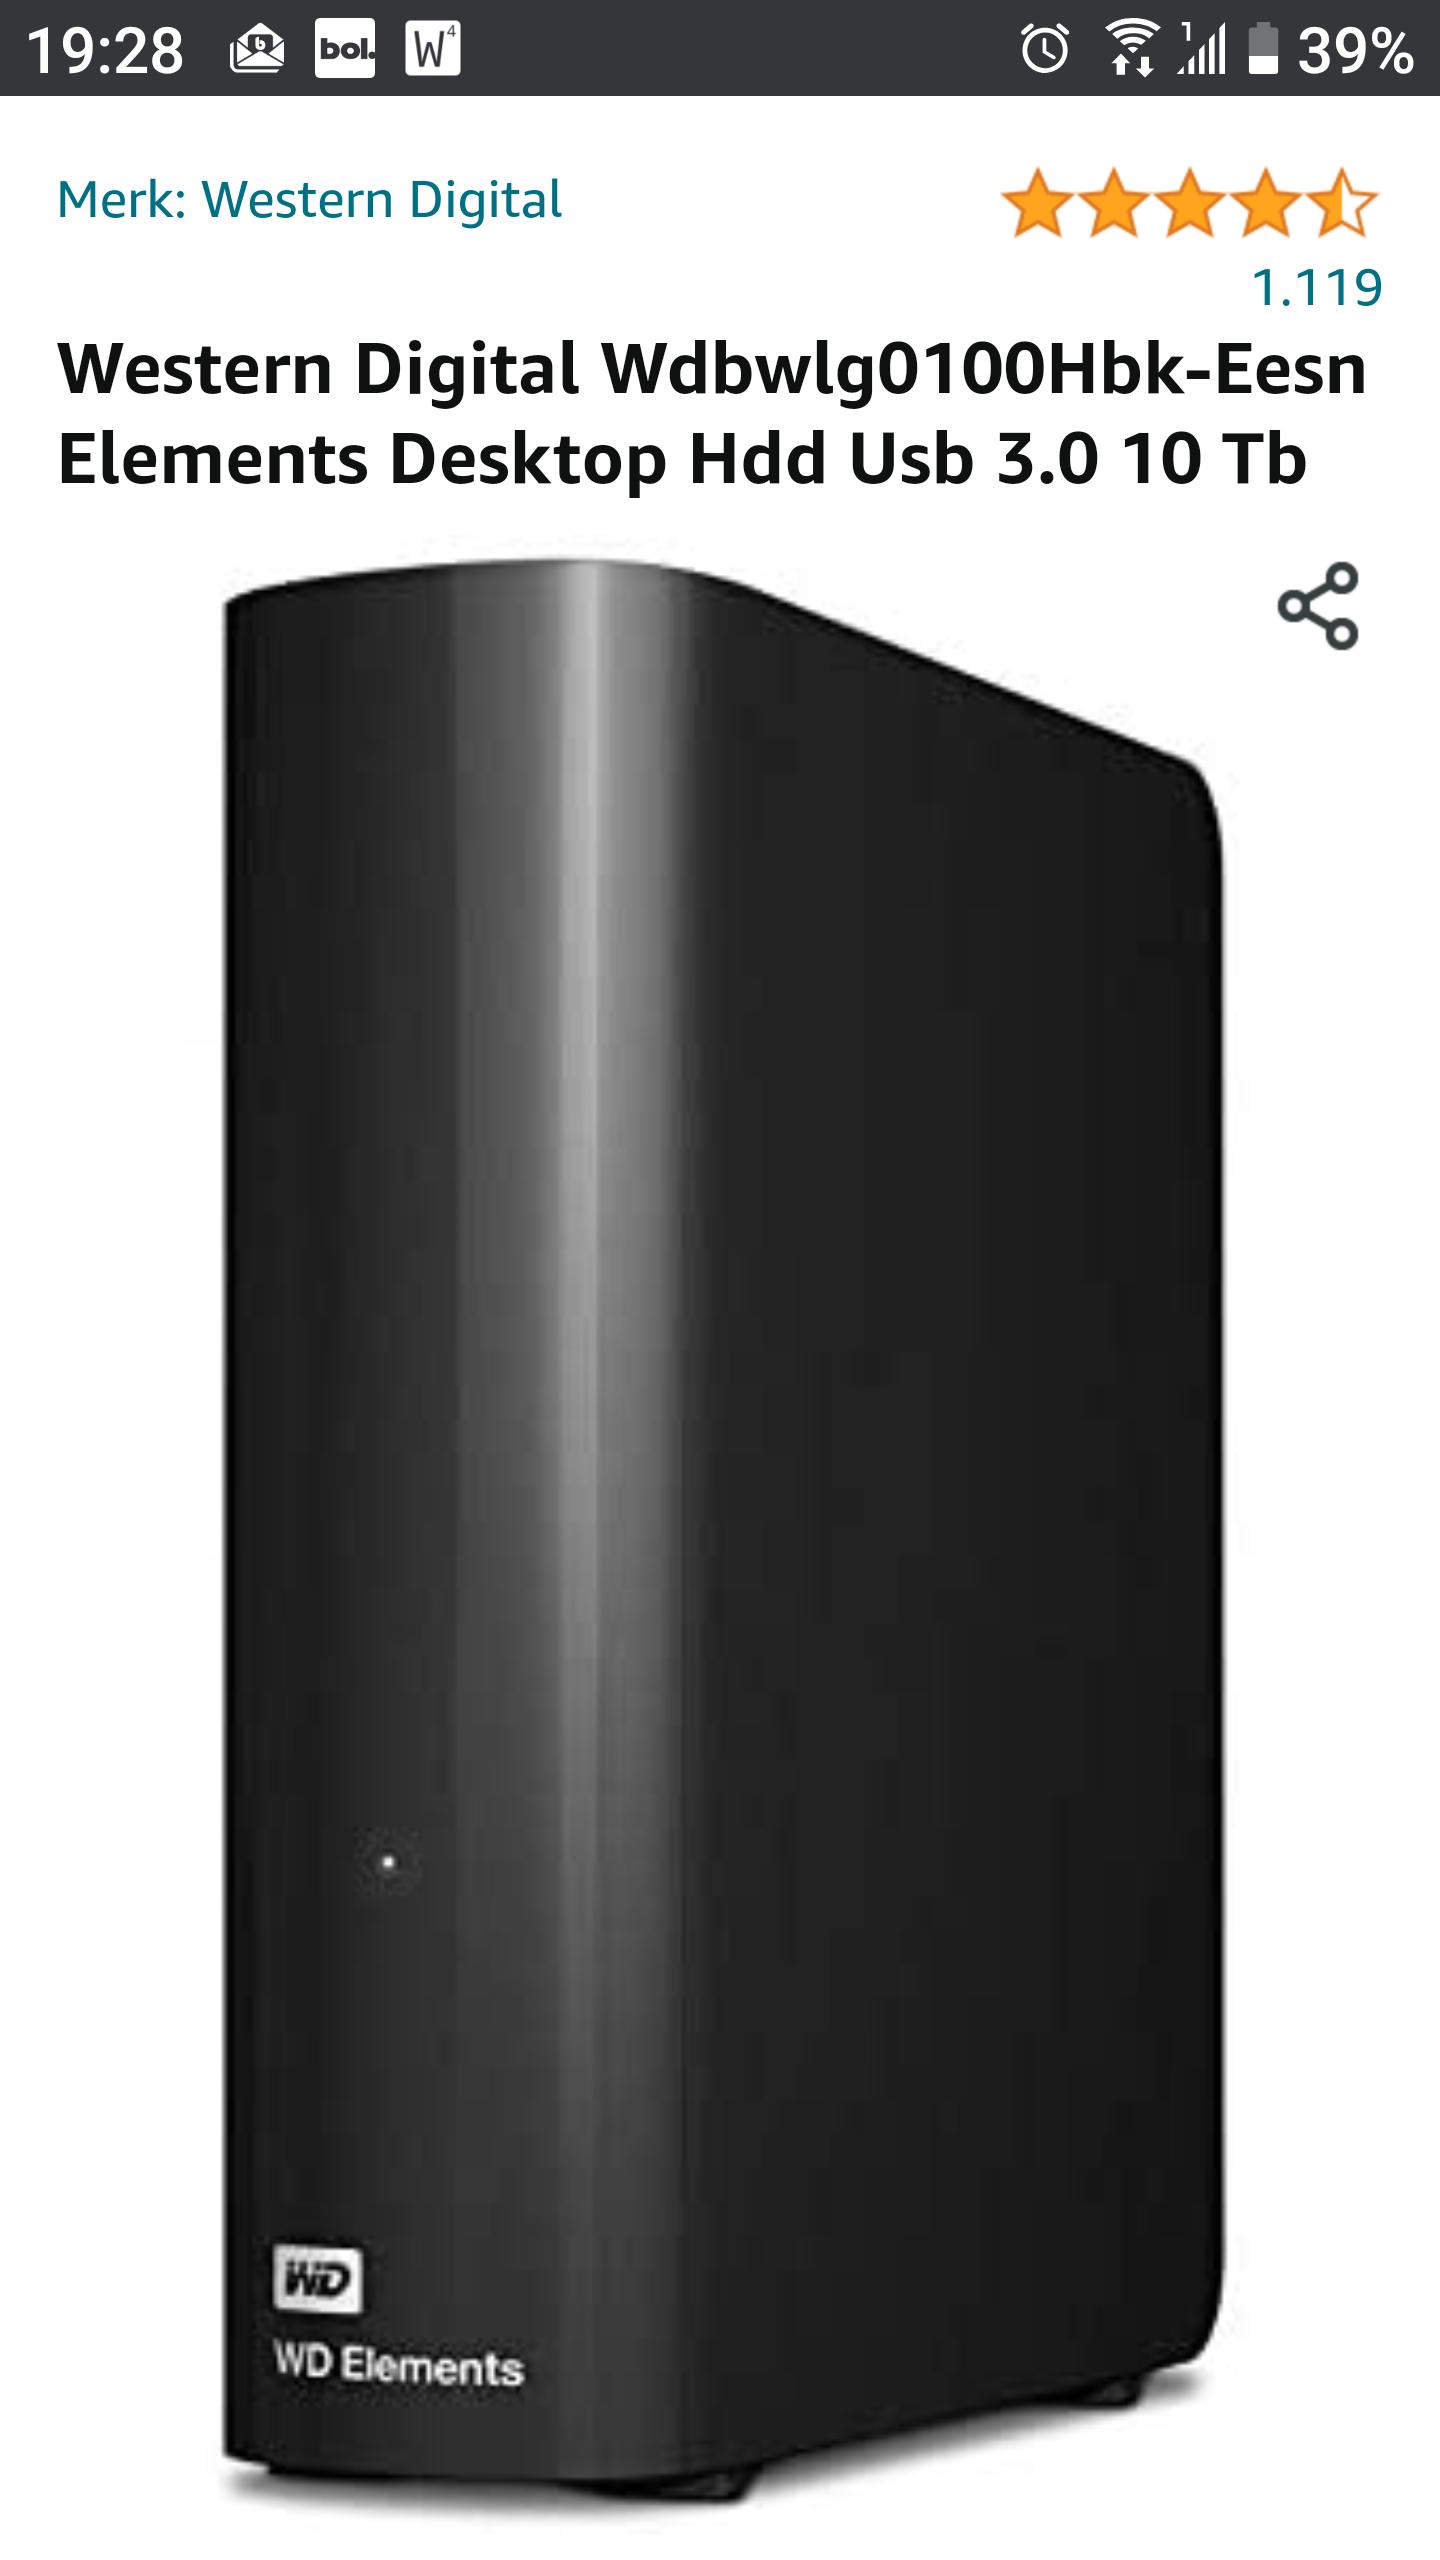 Western Digital 10TB Elements Desktop externe harde schijf USB3.0 -WDBWLG0100HBK-EESN